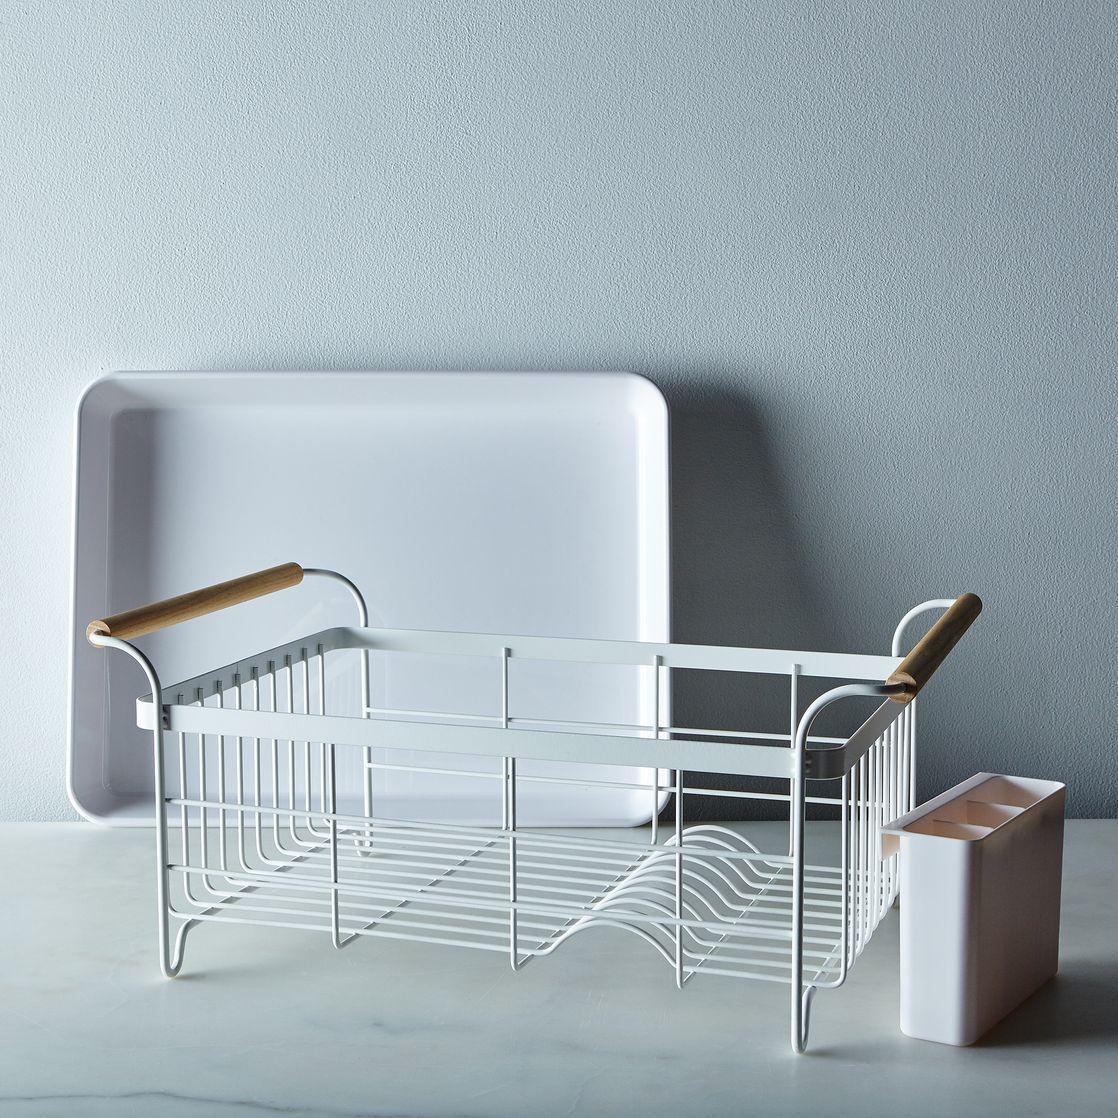 Wood-Handled Dish Rack   Dish racks, Woods and Kitchens